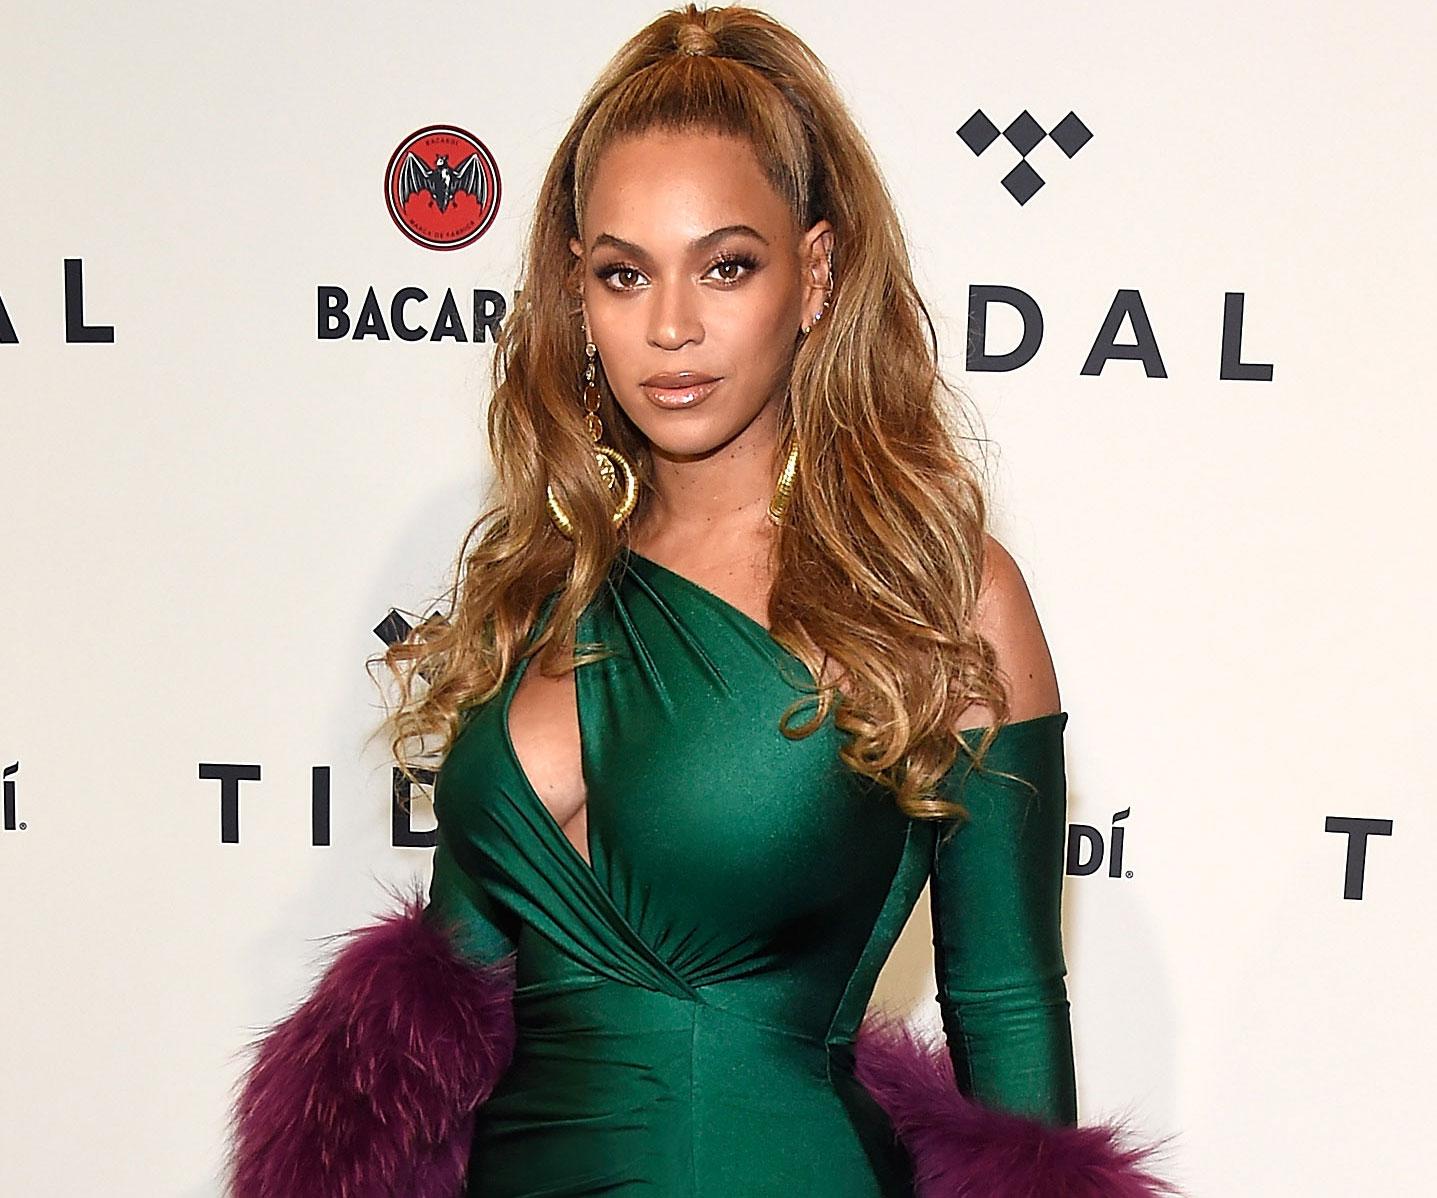 Is the Actress Who Bit Beyonce Sanaa Lathan?